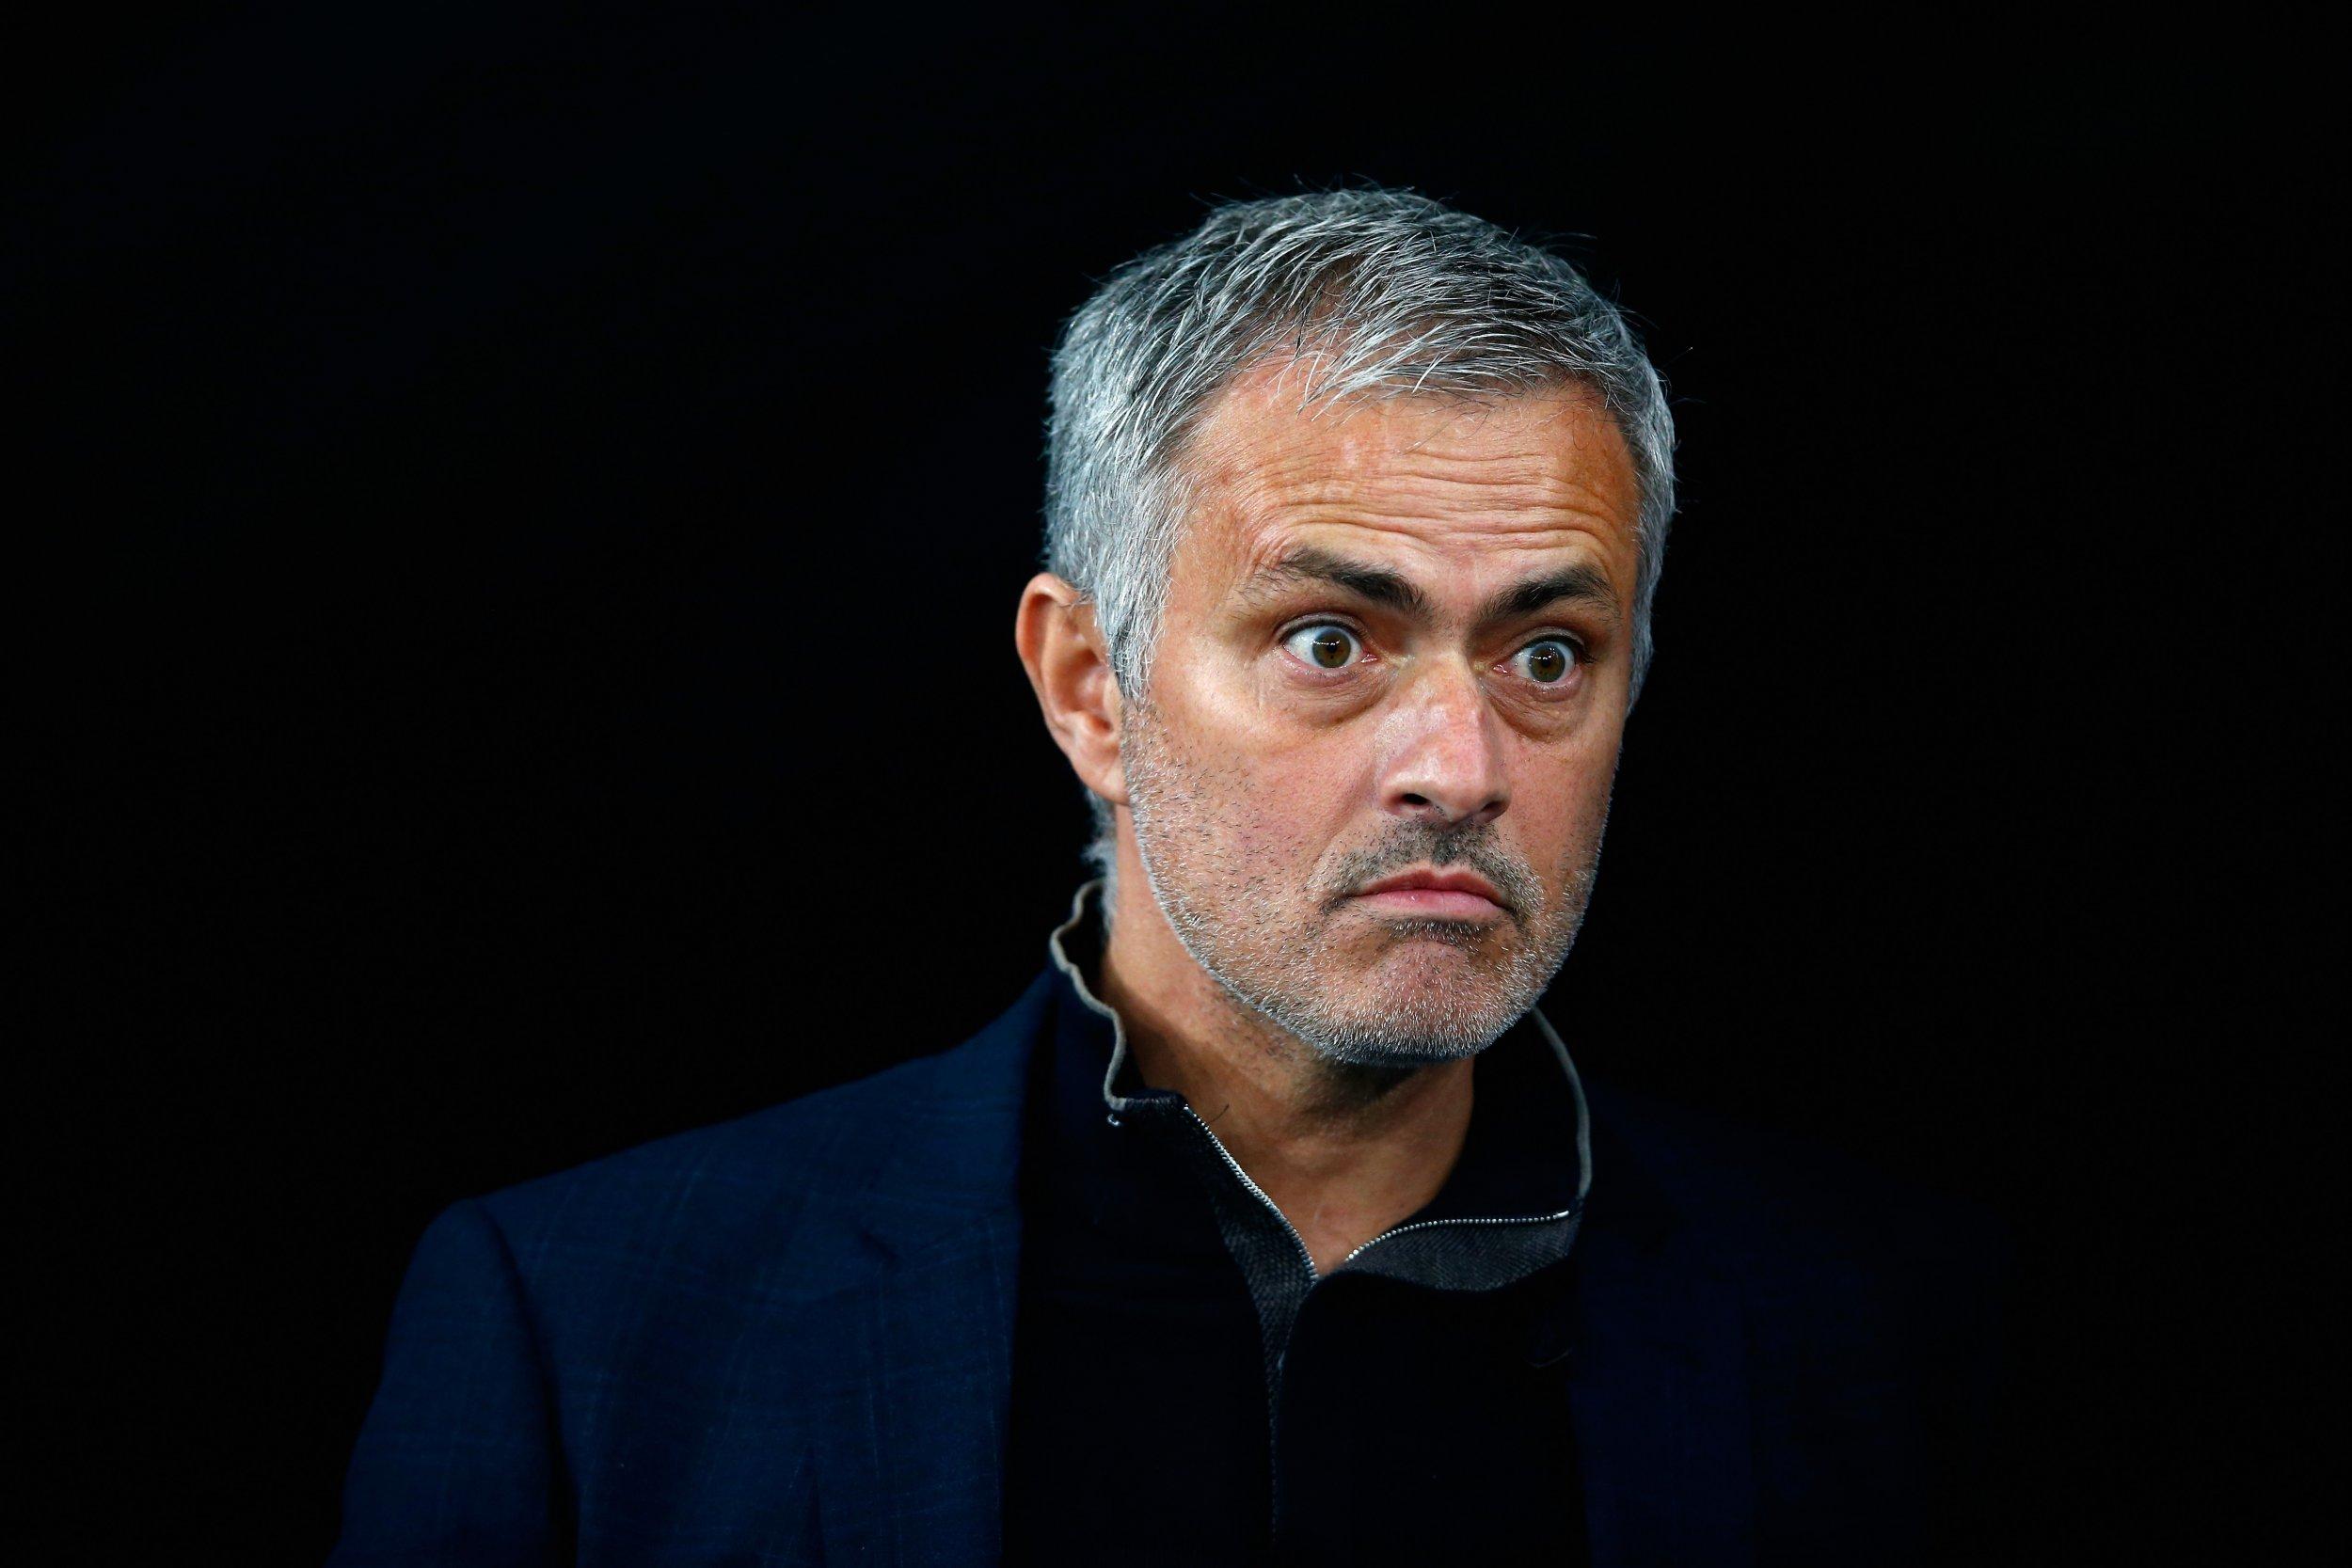 jose mourinho - photo #27